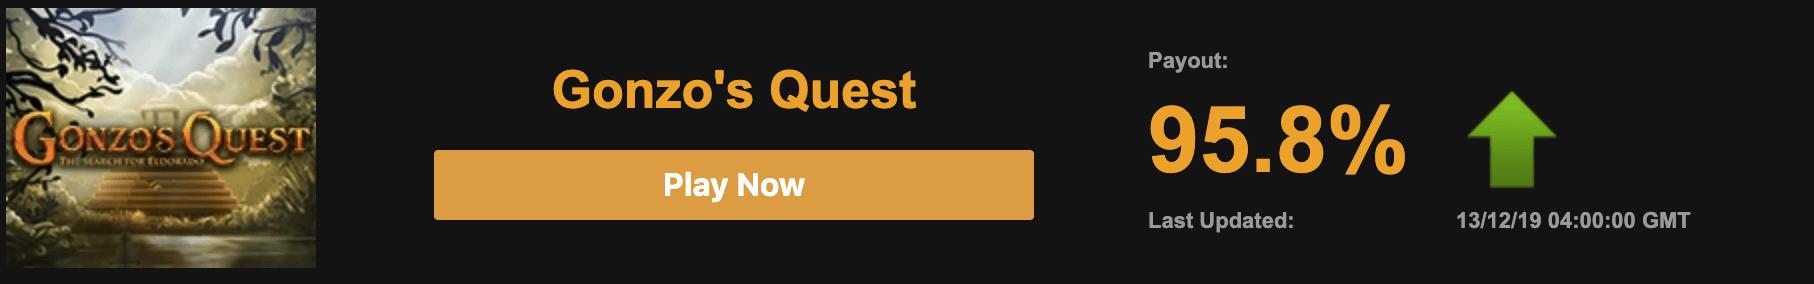 Gonzo's Quest hos Video slots